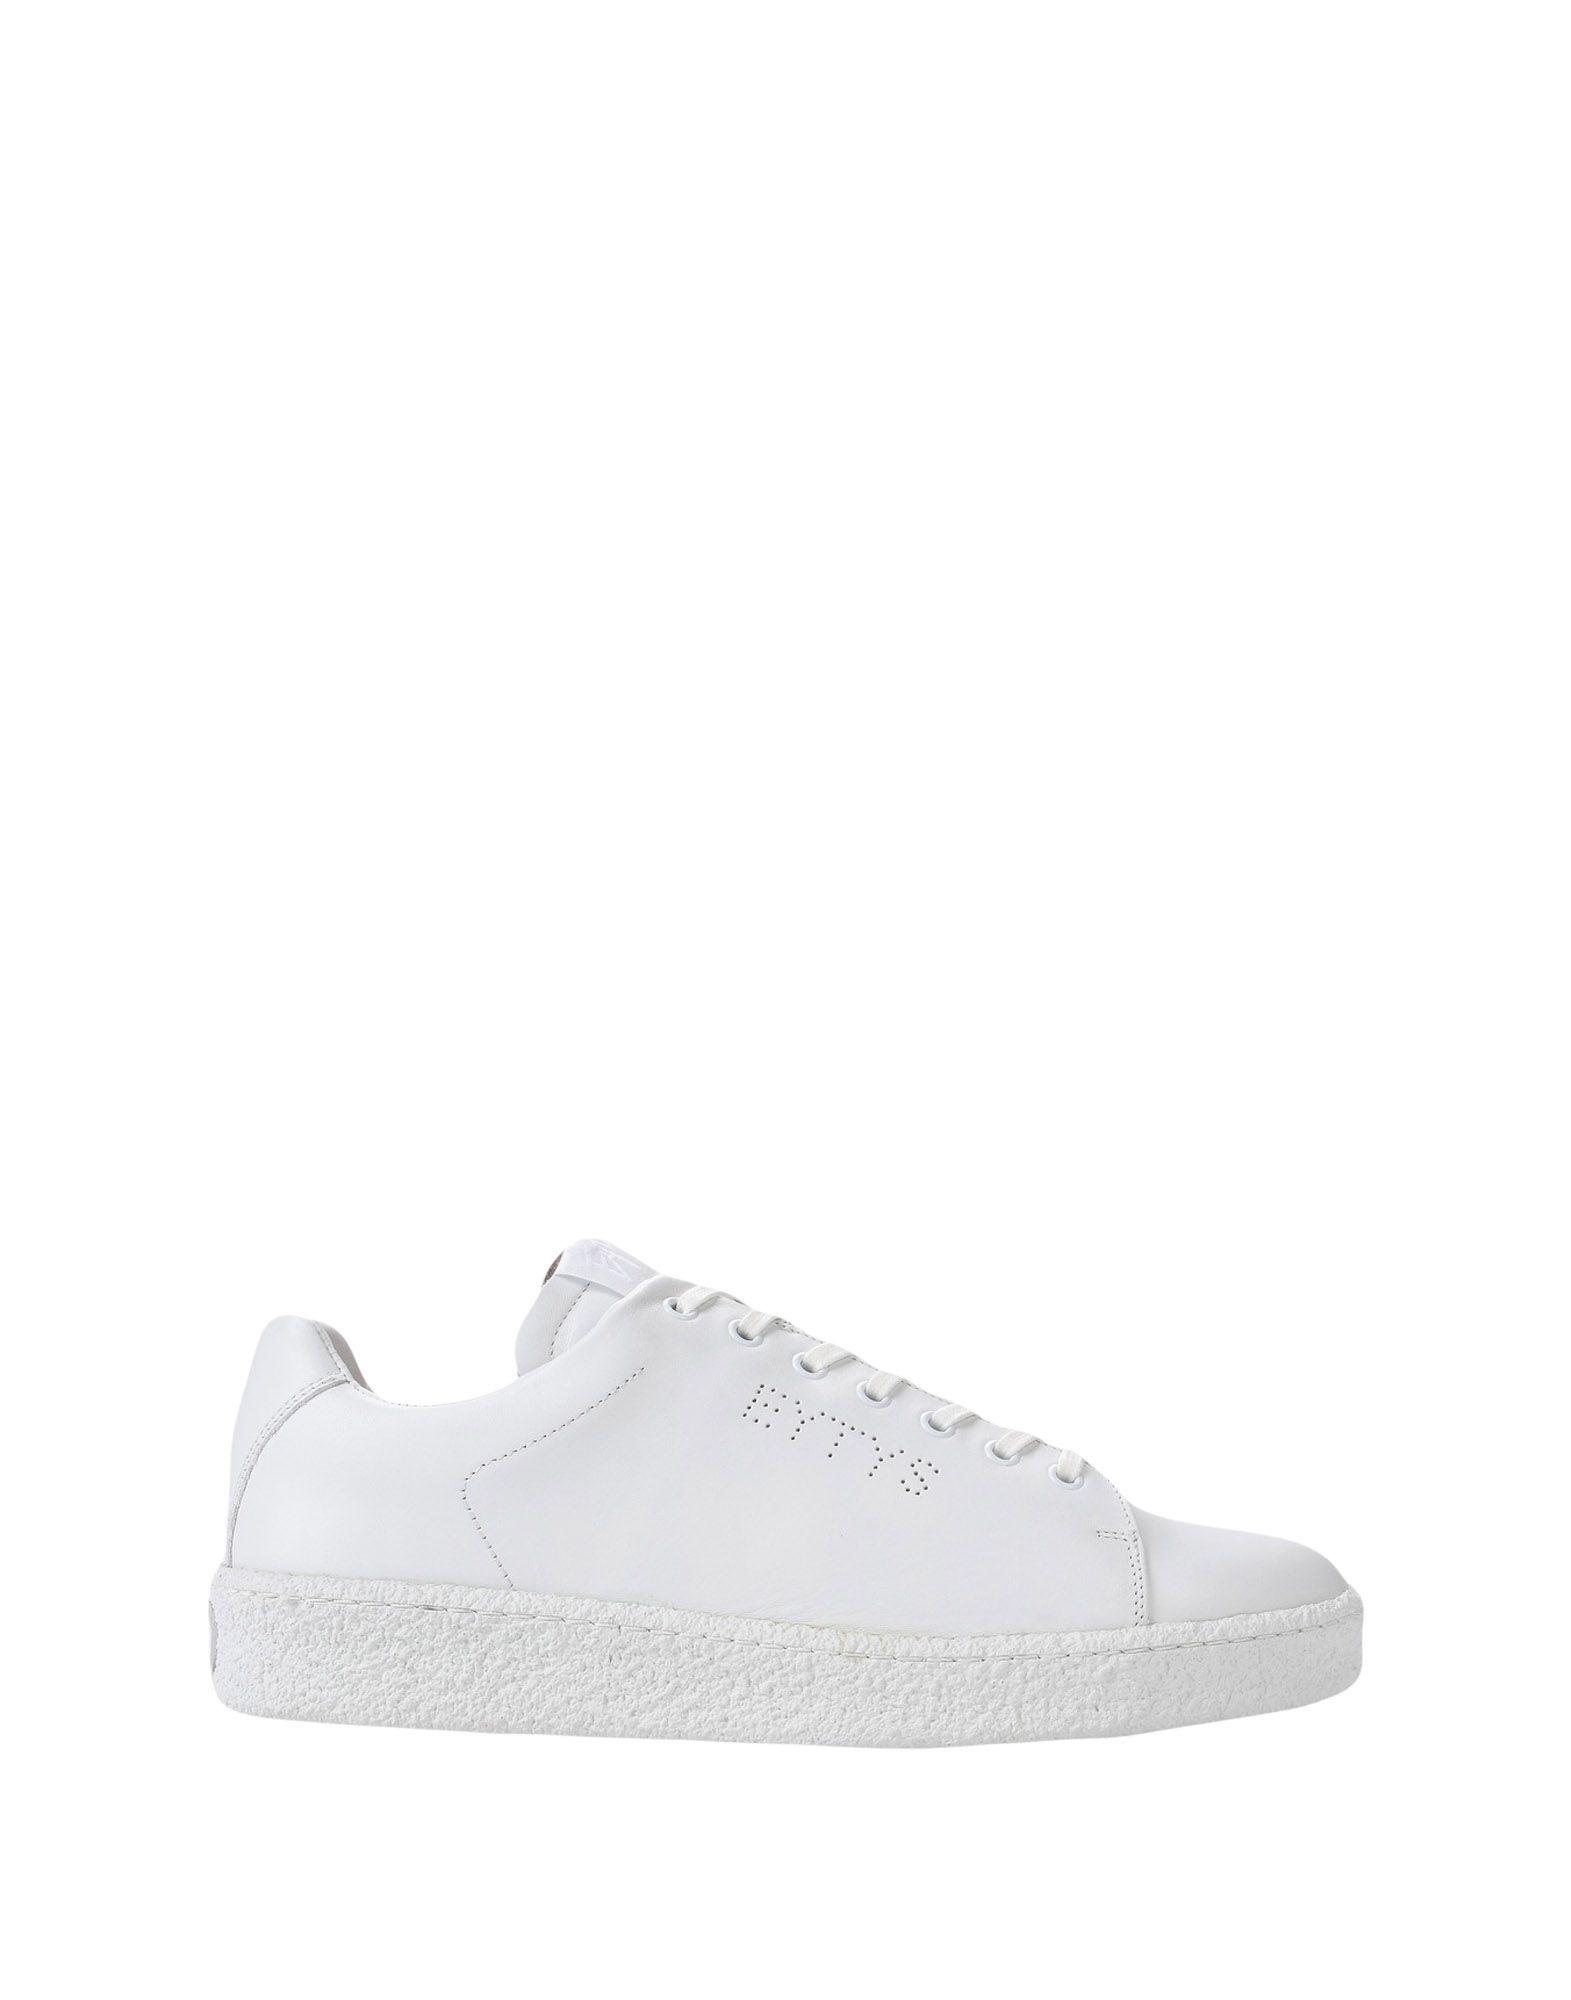 Eytys Sneakers Herren  11437598IM Gute Qualität beliebte Schuhe